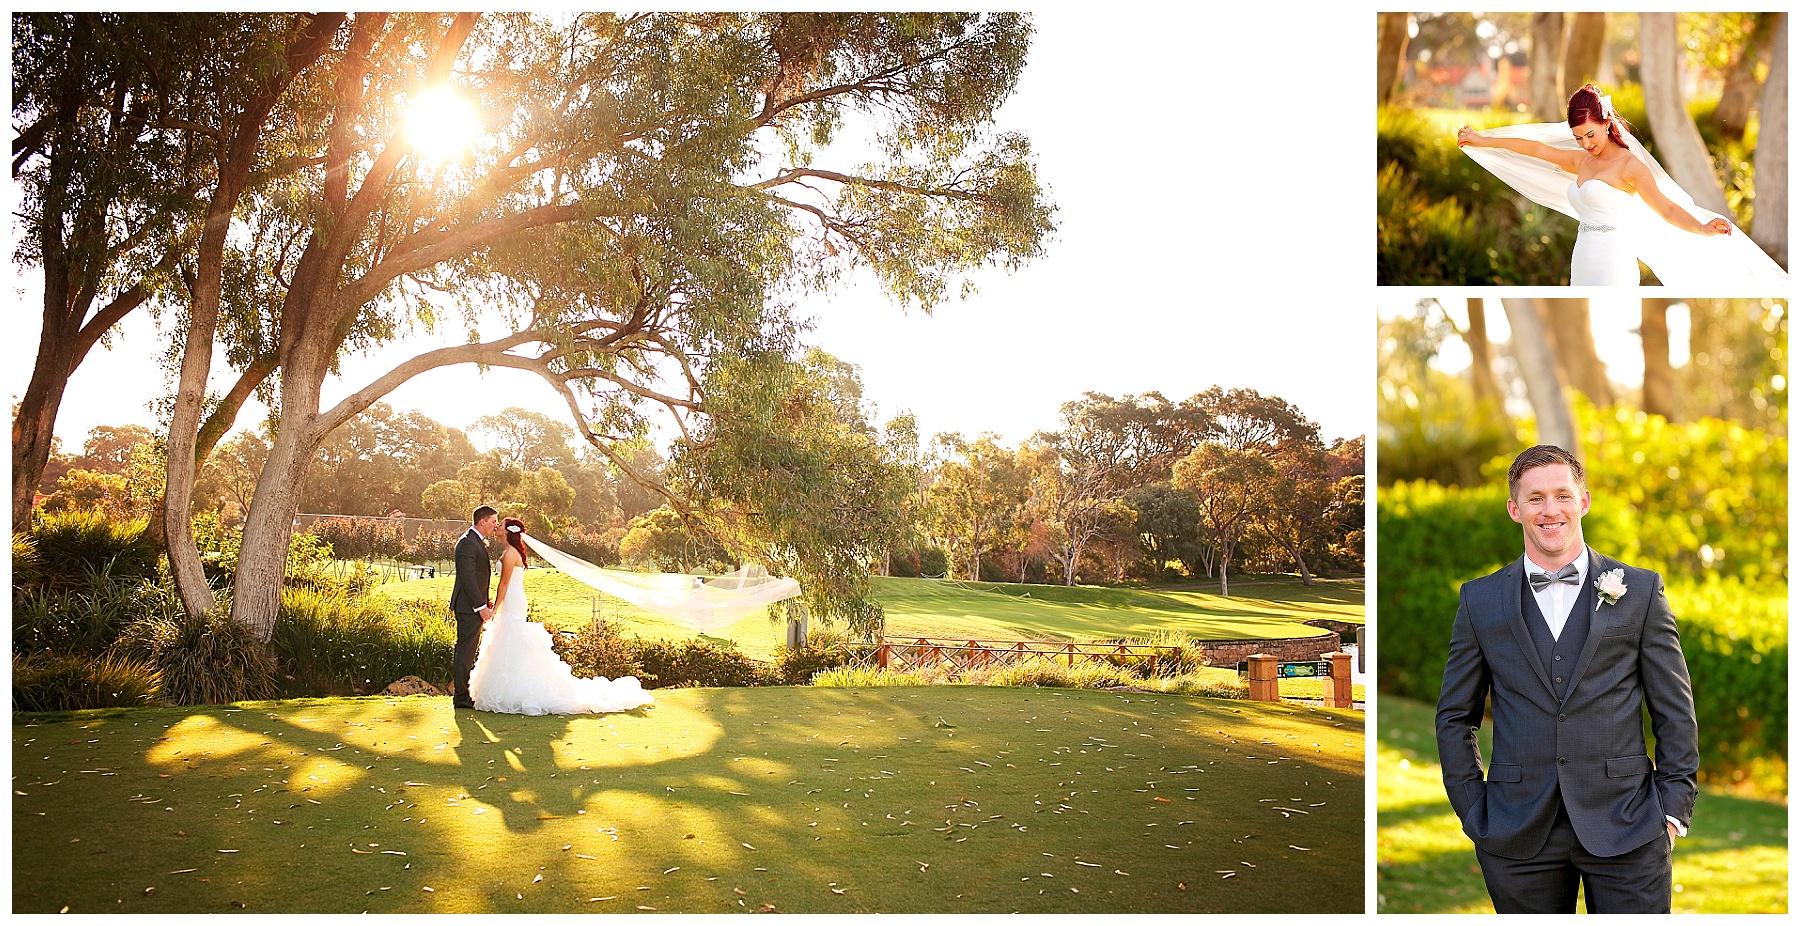 joondalup resort wedding